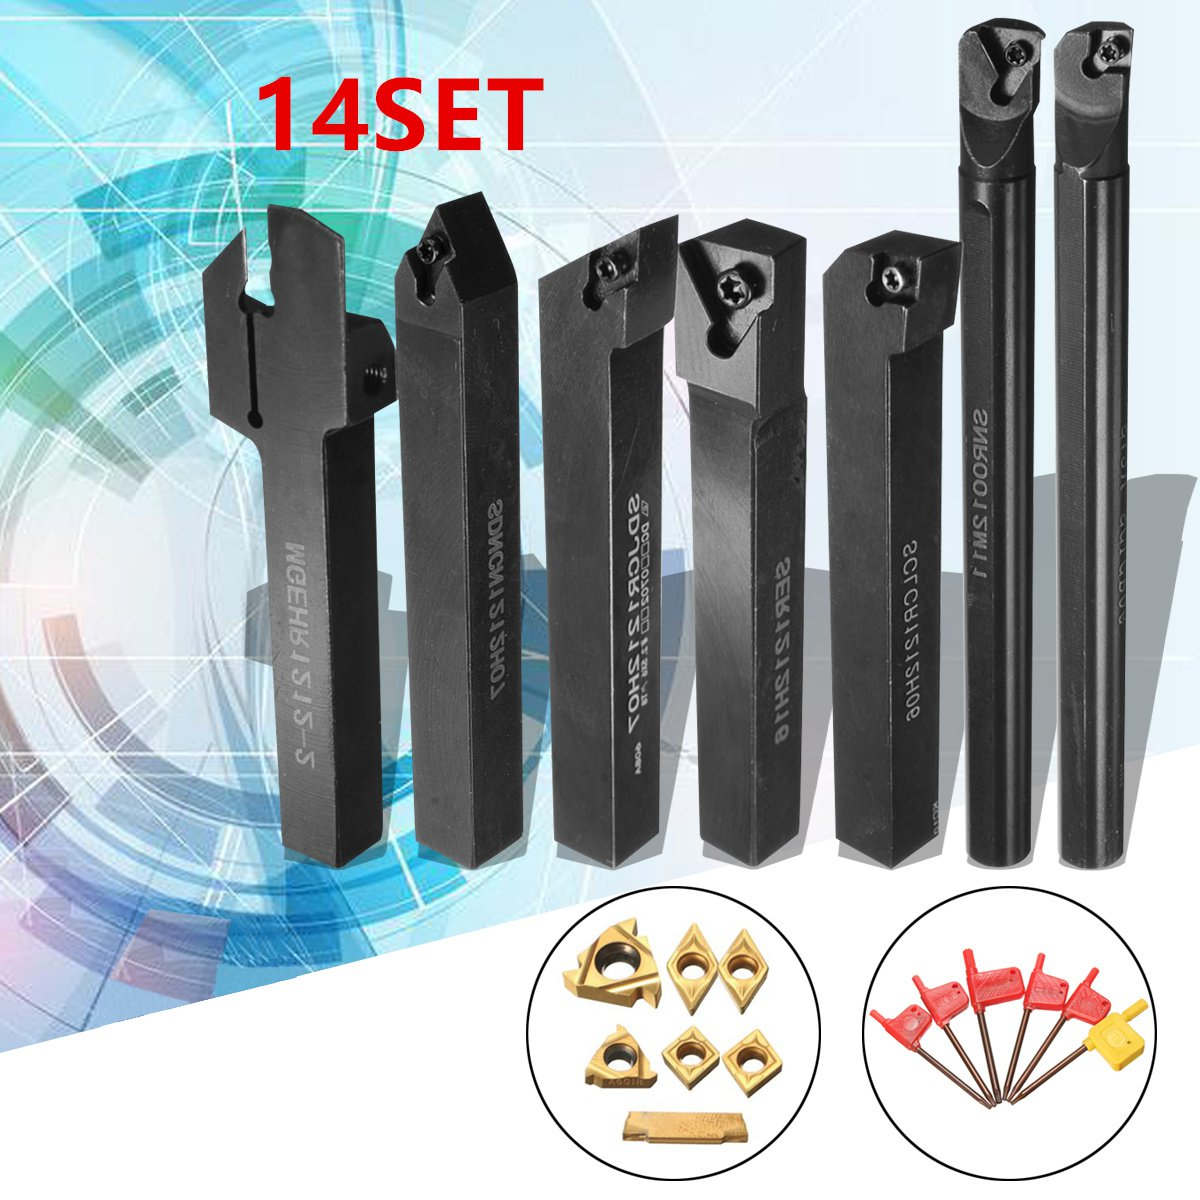 12mm 21 pçs/set Shank Torno Virando Ferramenta Chato Titular Bar + Insert + Chave S12M-SCLCR06/SER1212H16/SCL1212H06